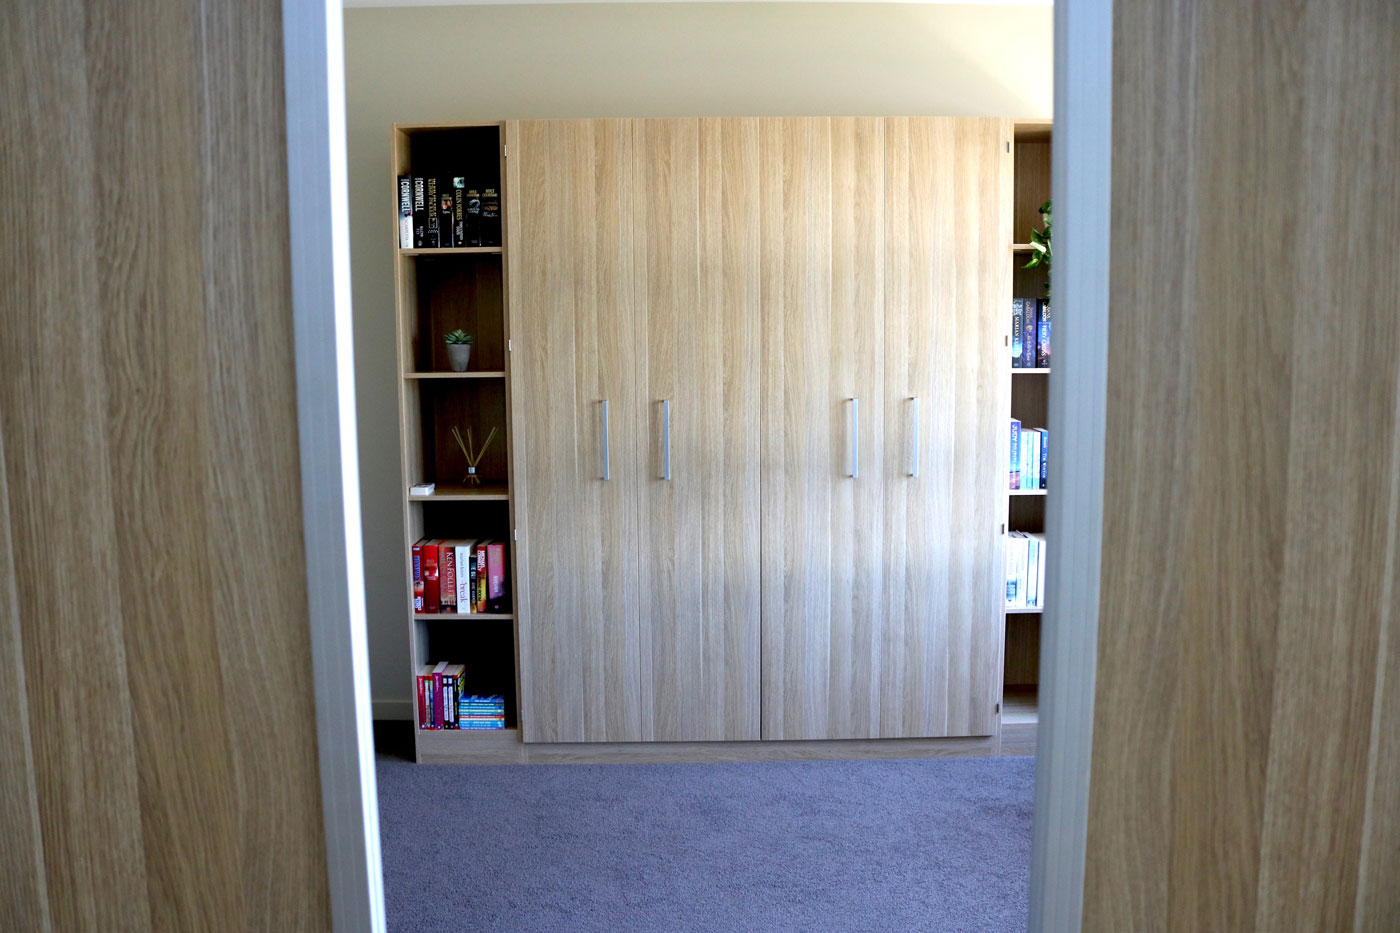 wall-bed-and-door